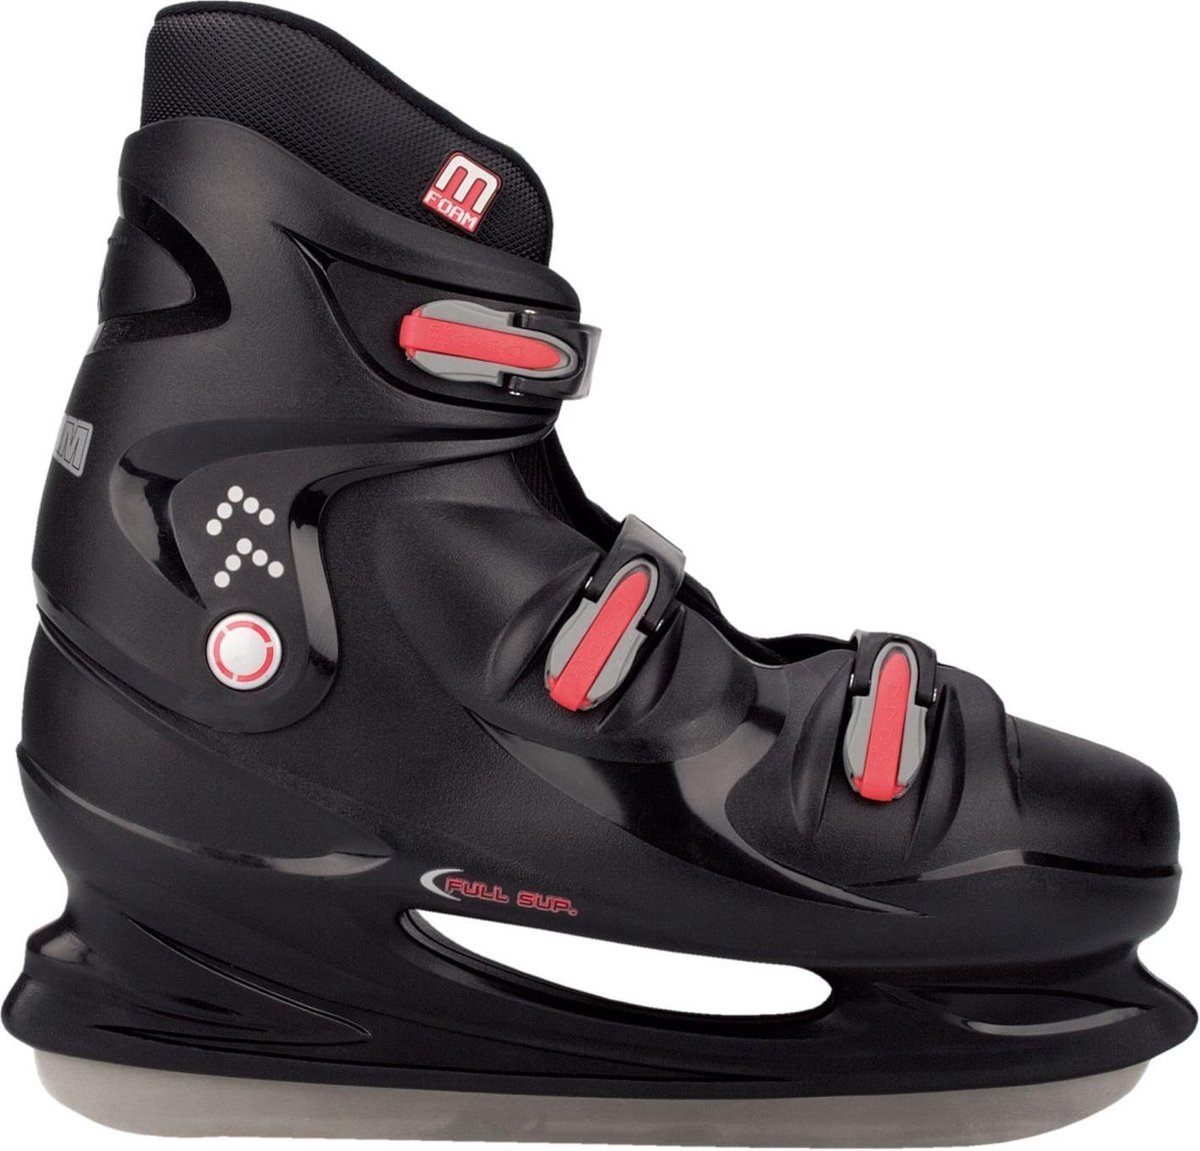 Nijdam IJshockeyschaats XXL - Hardboot - Zwart/Zilver/Rood - 50